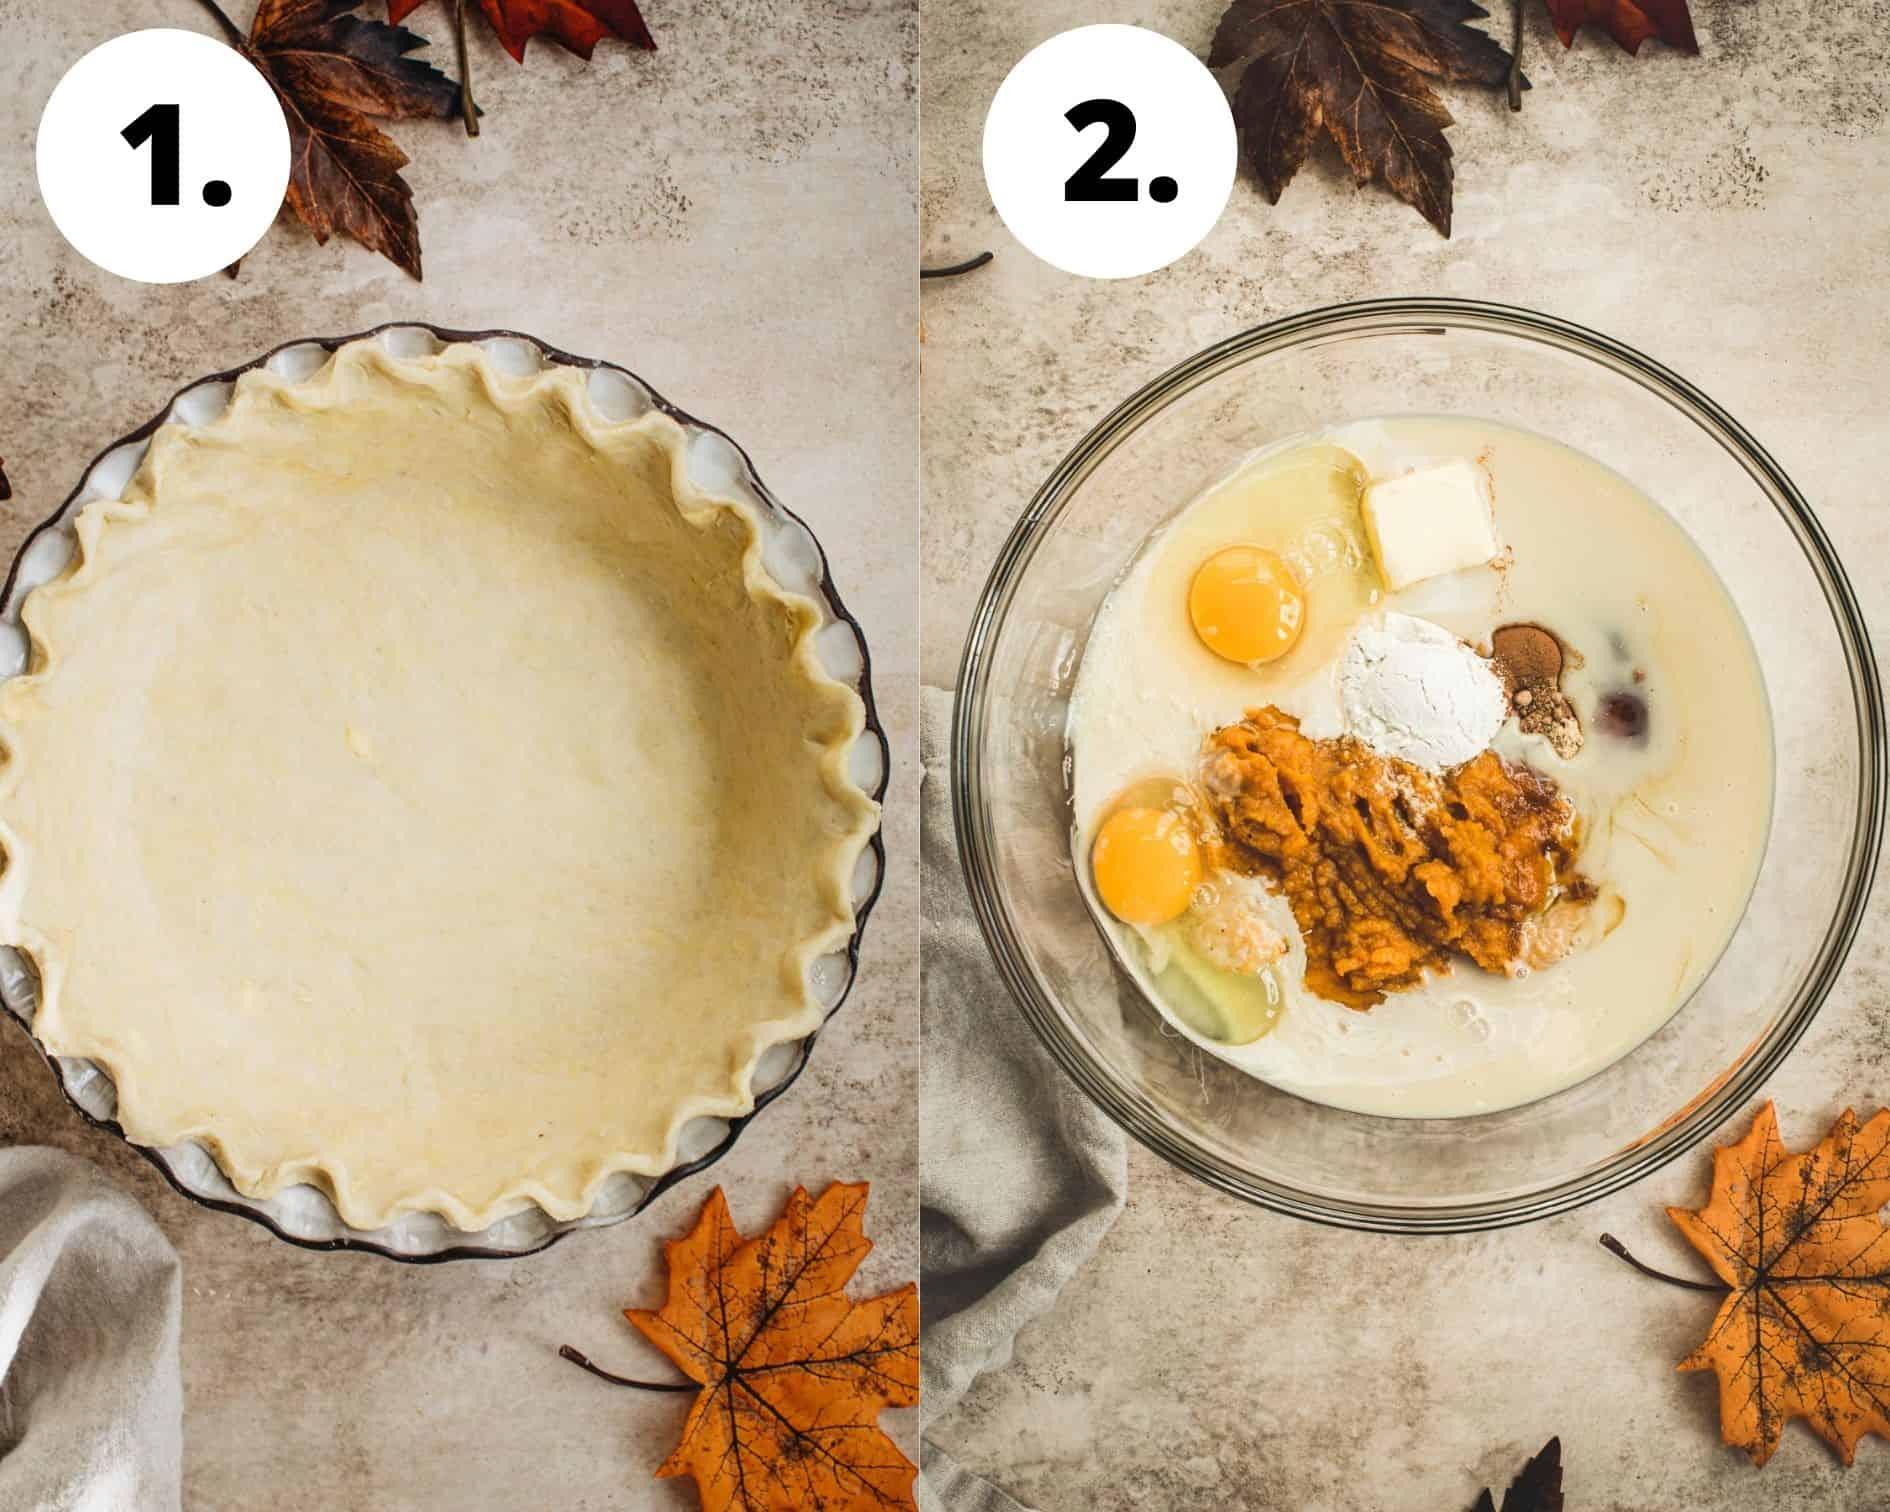 Maple pumpkin pie process steps 1 and 2.